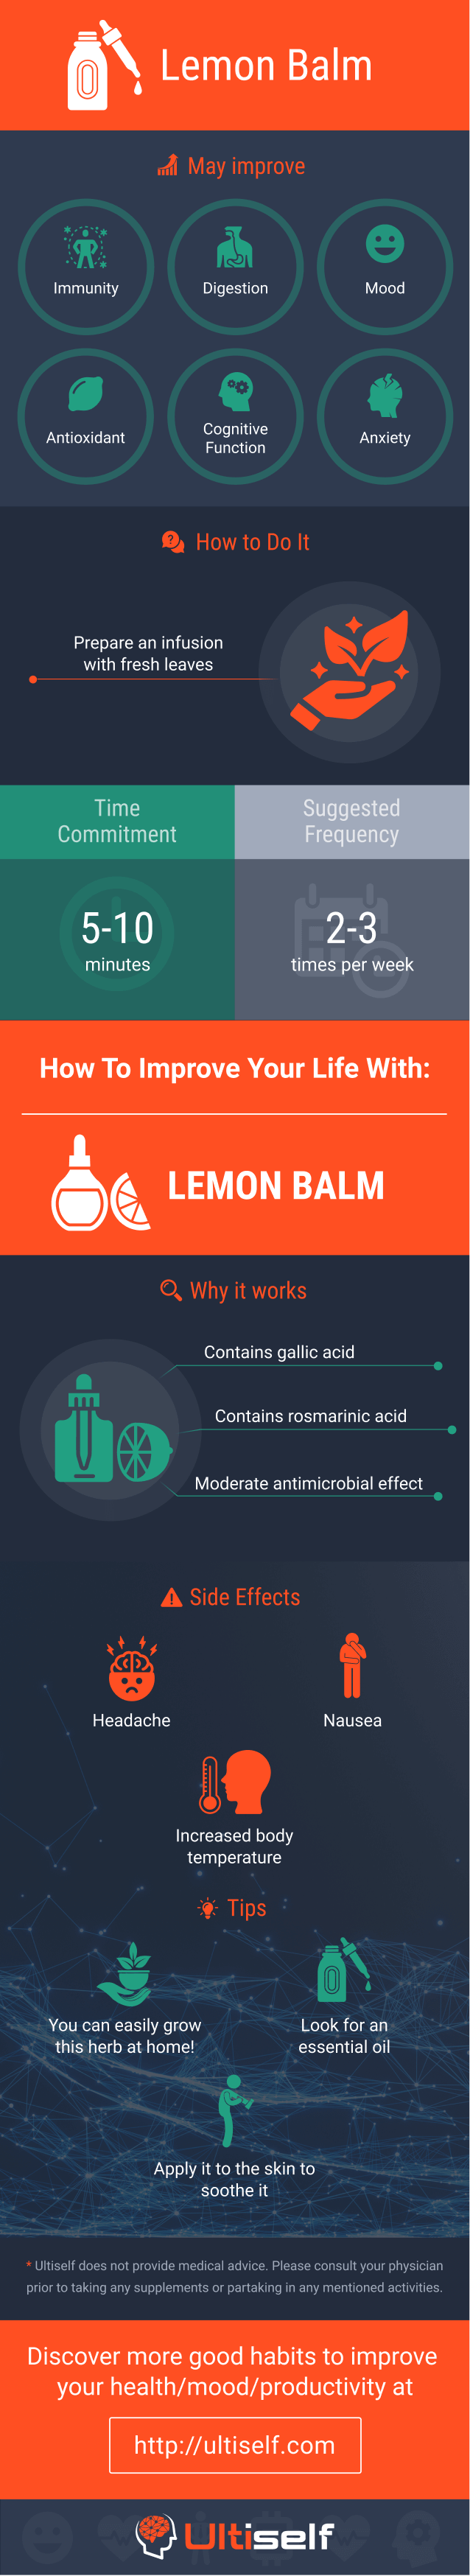 Lemon Balm infographic